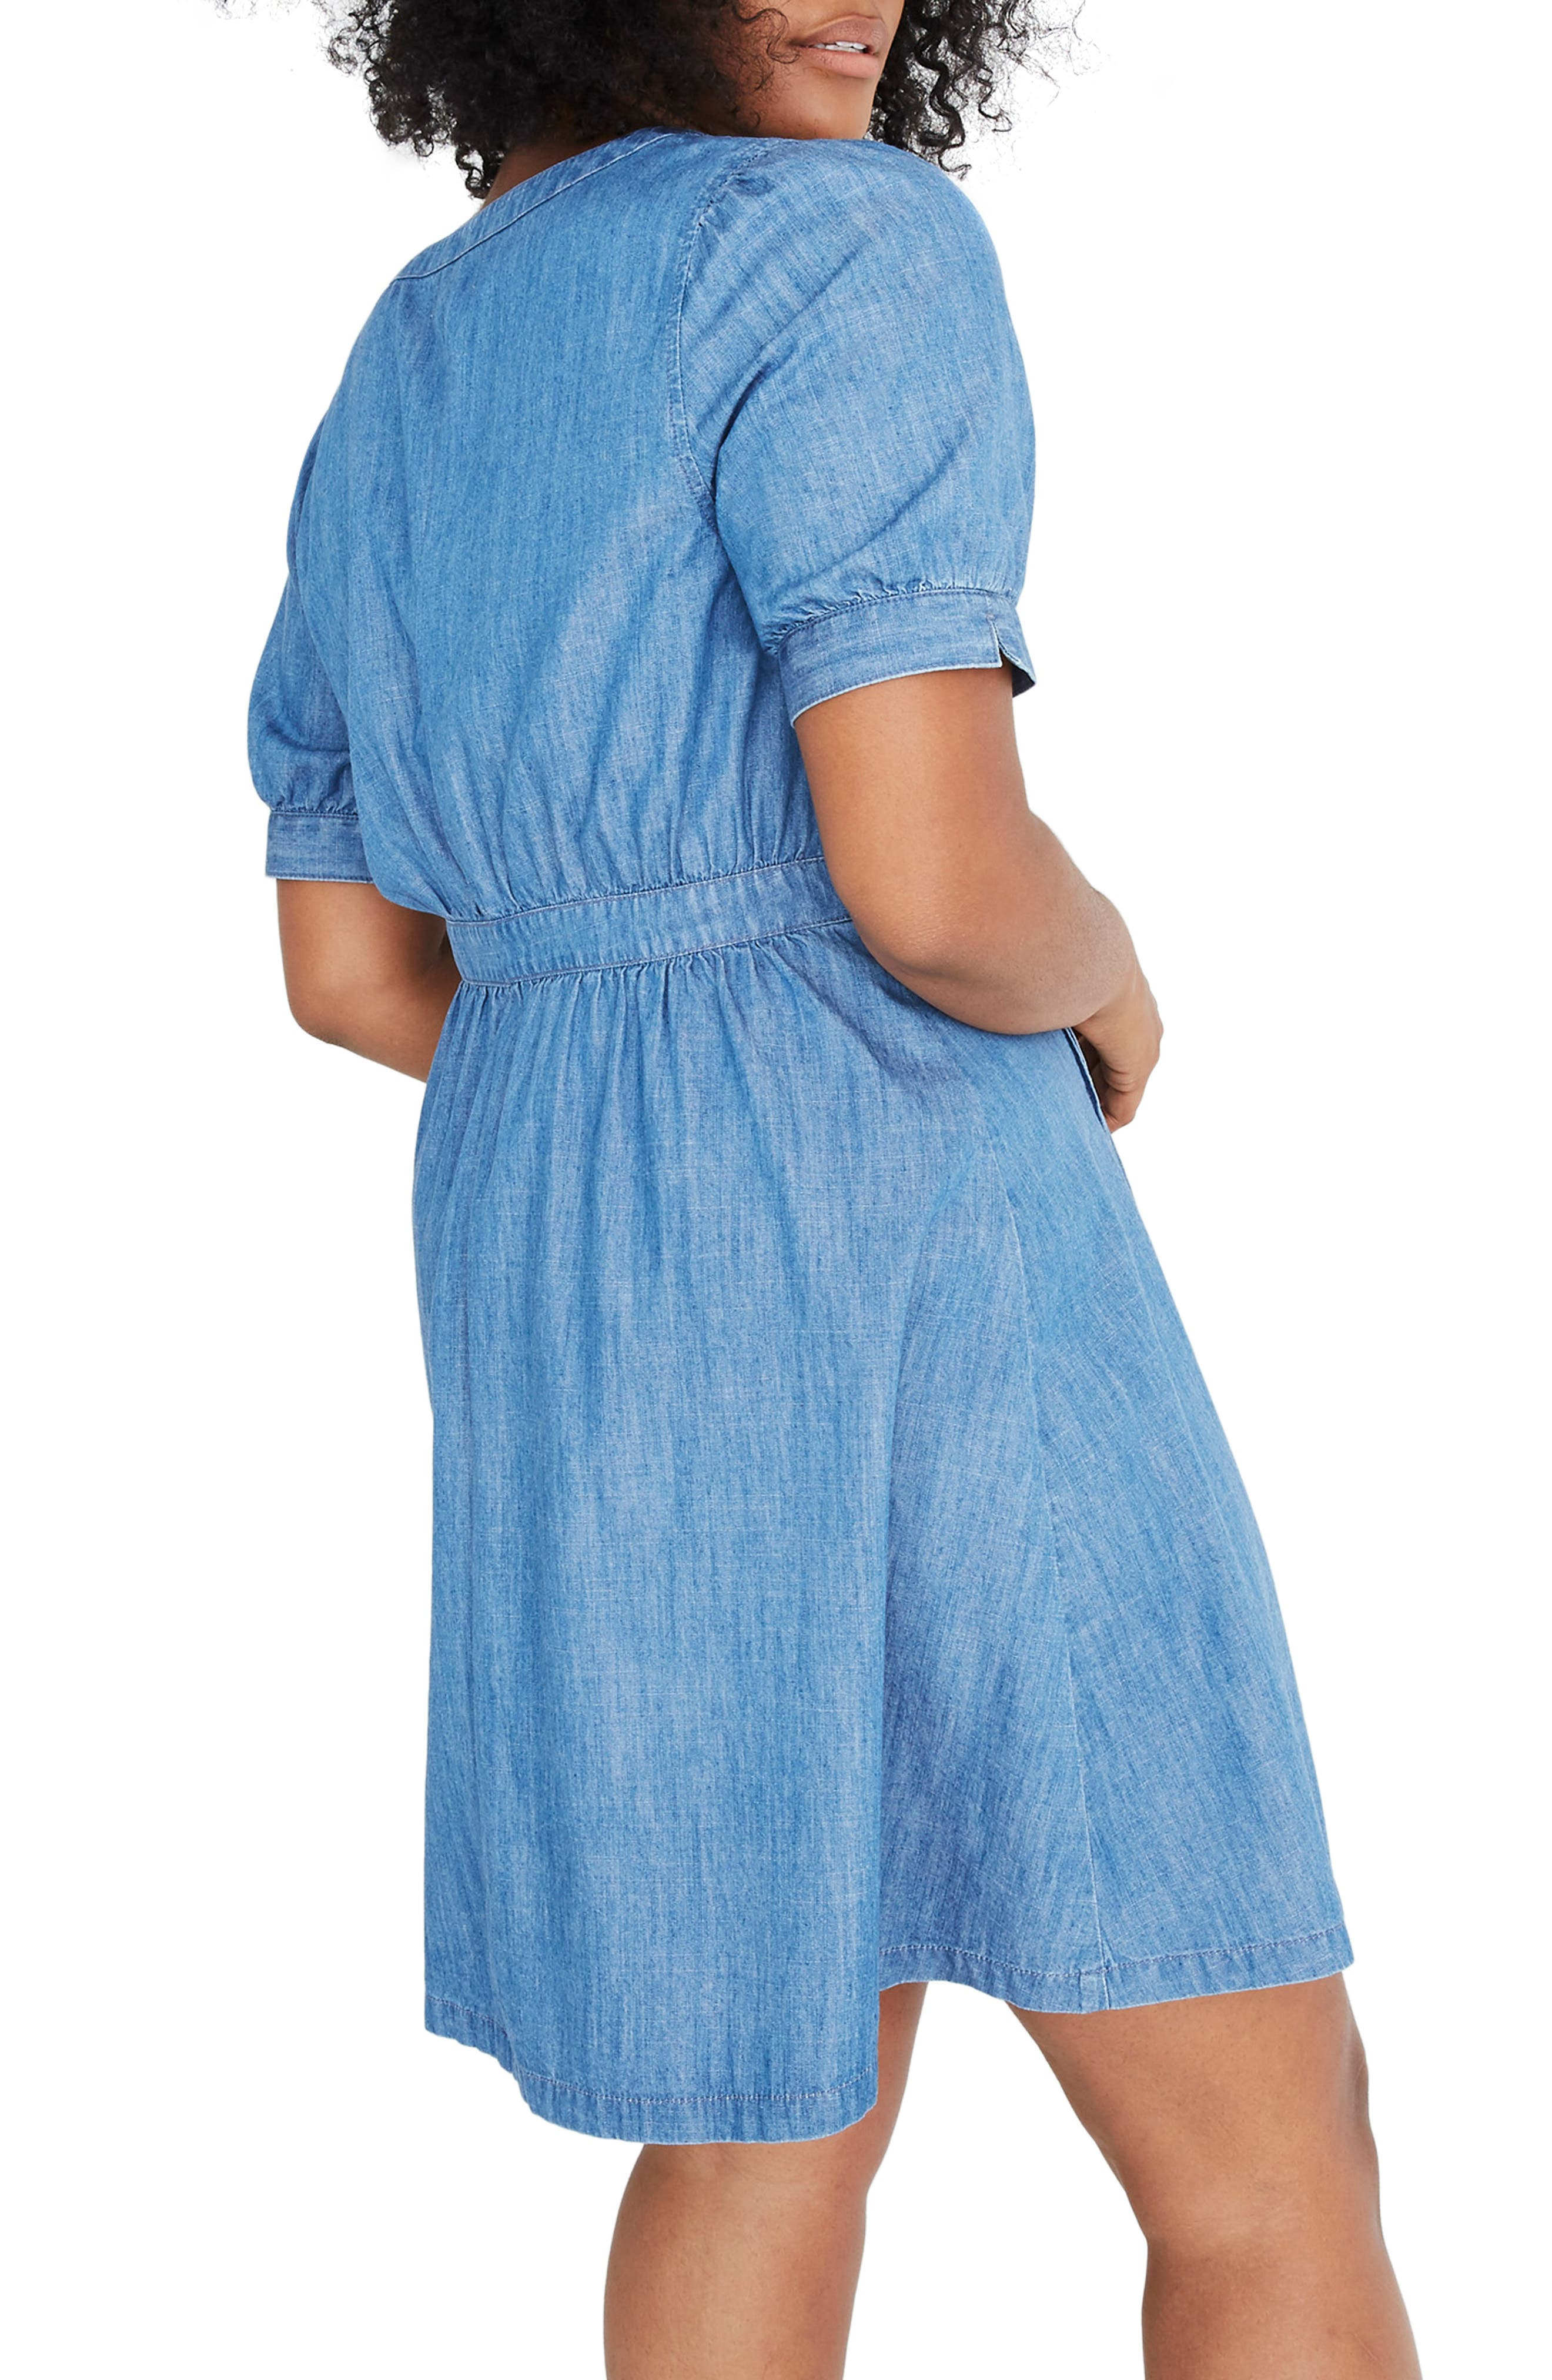 Denim Daylily Dress,                             Alternate thumbnail 7, color,                             ANNETTA WASH